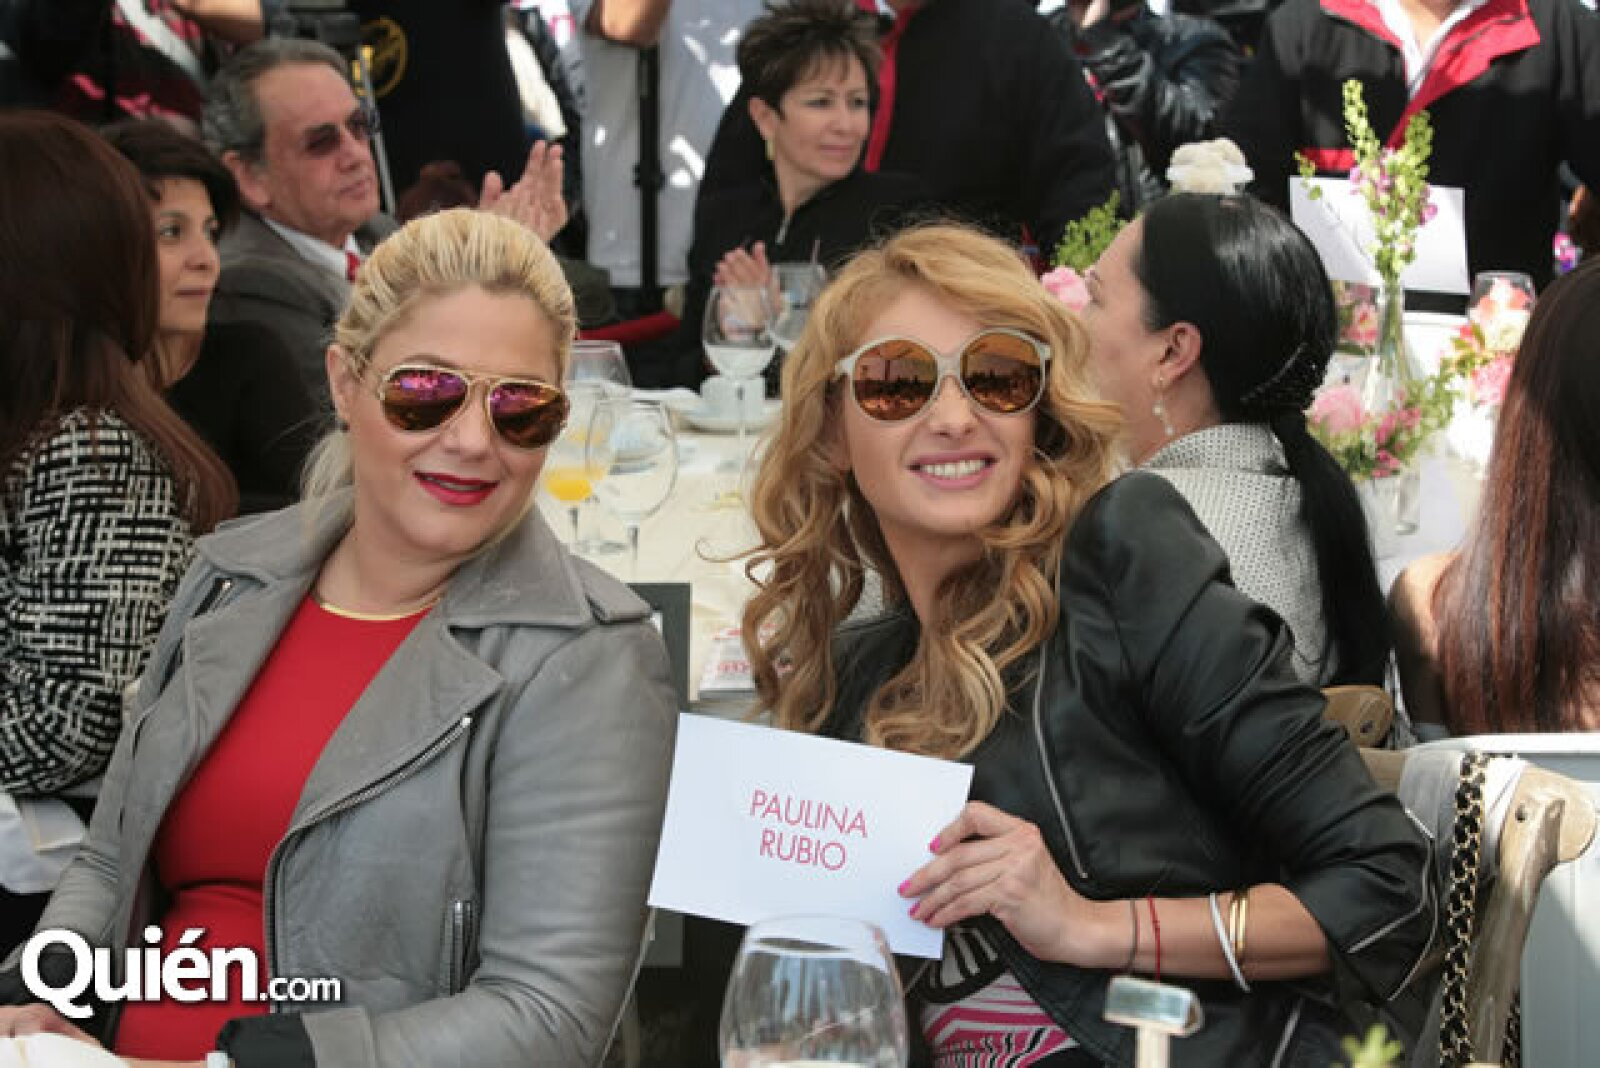 Liliana Sada y Paulina Rubio